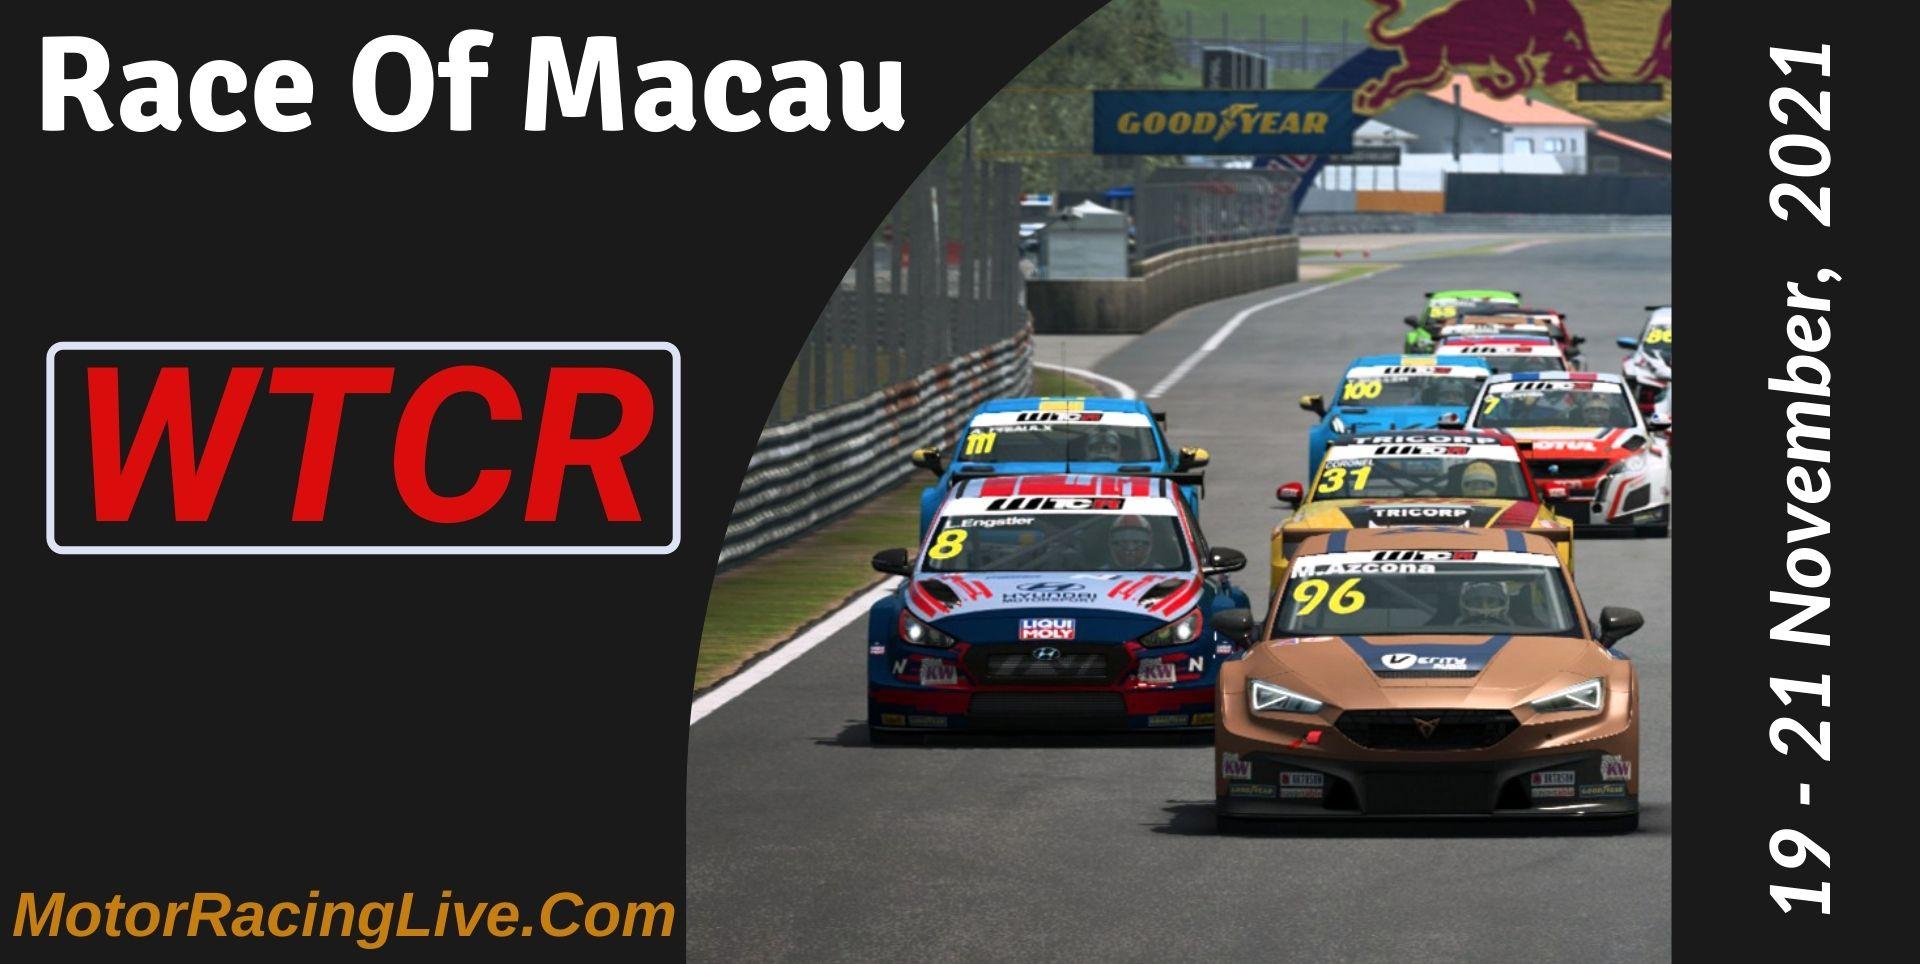 Race Of Macau Live Stream 2021 | WTCR